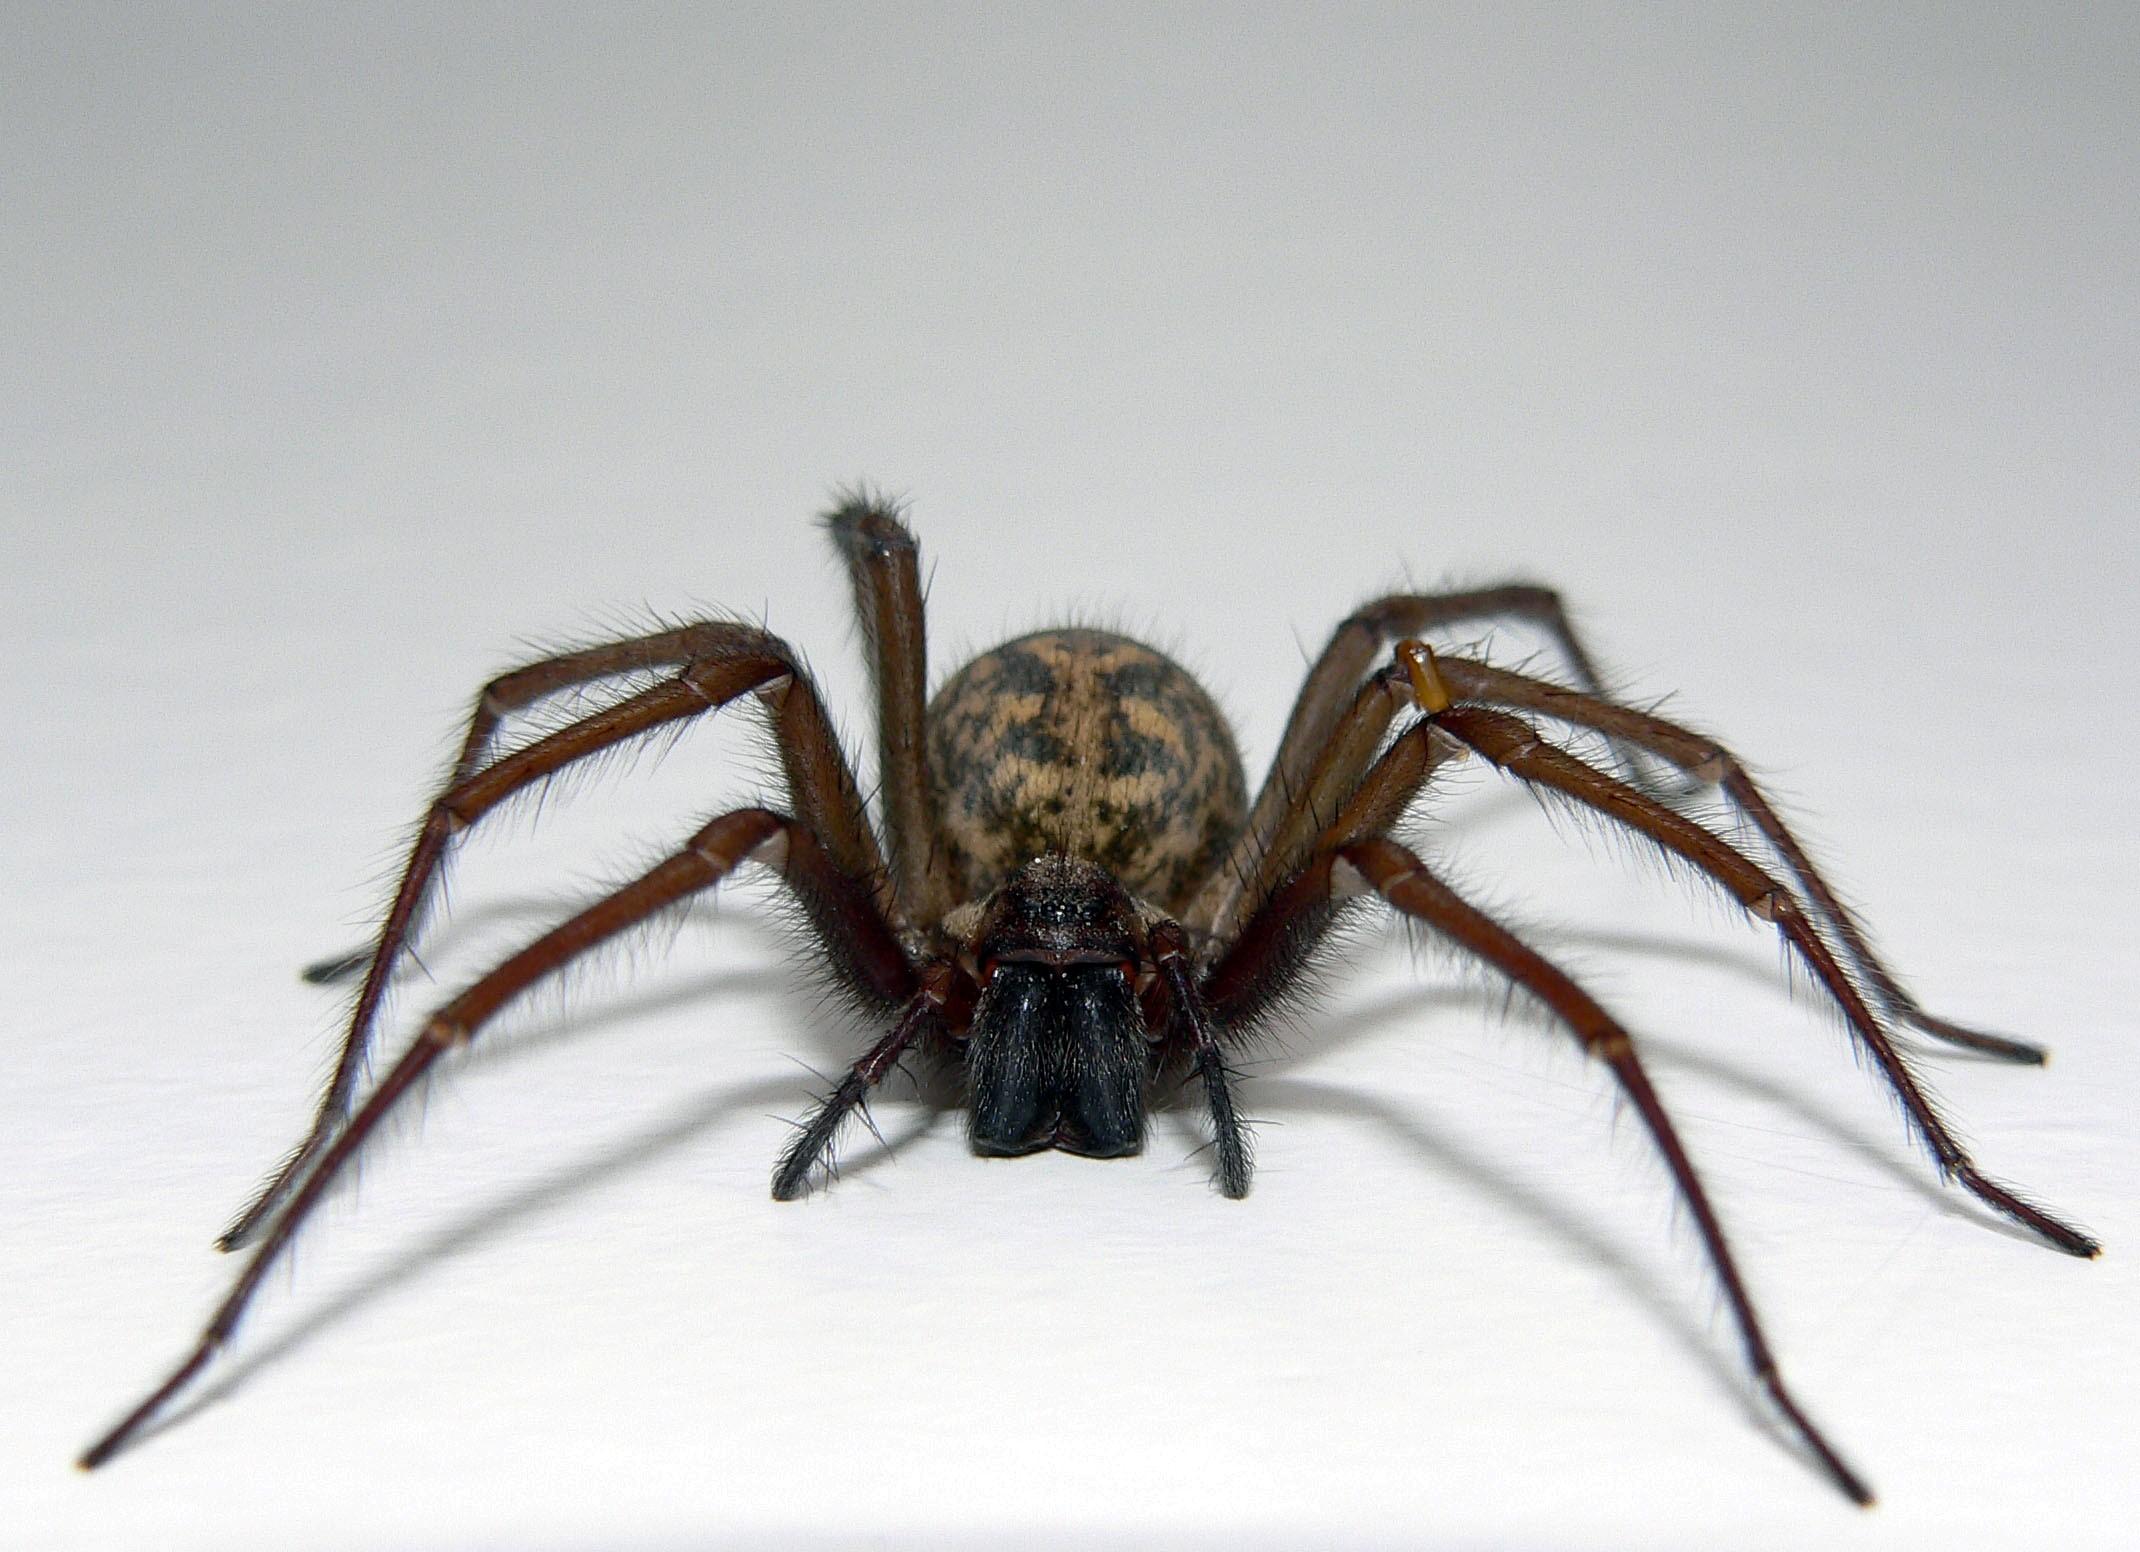 HD Cute Spider Wallpaper HD Wallpapers 2140x1552